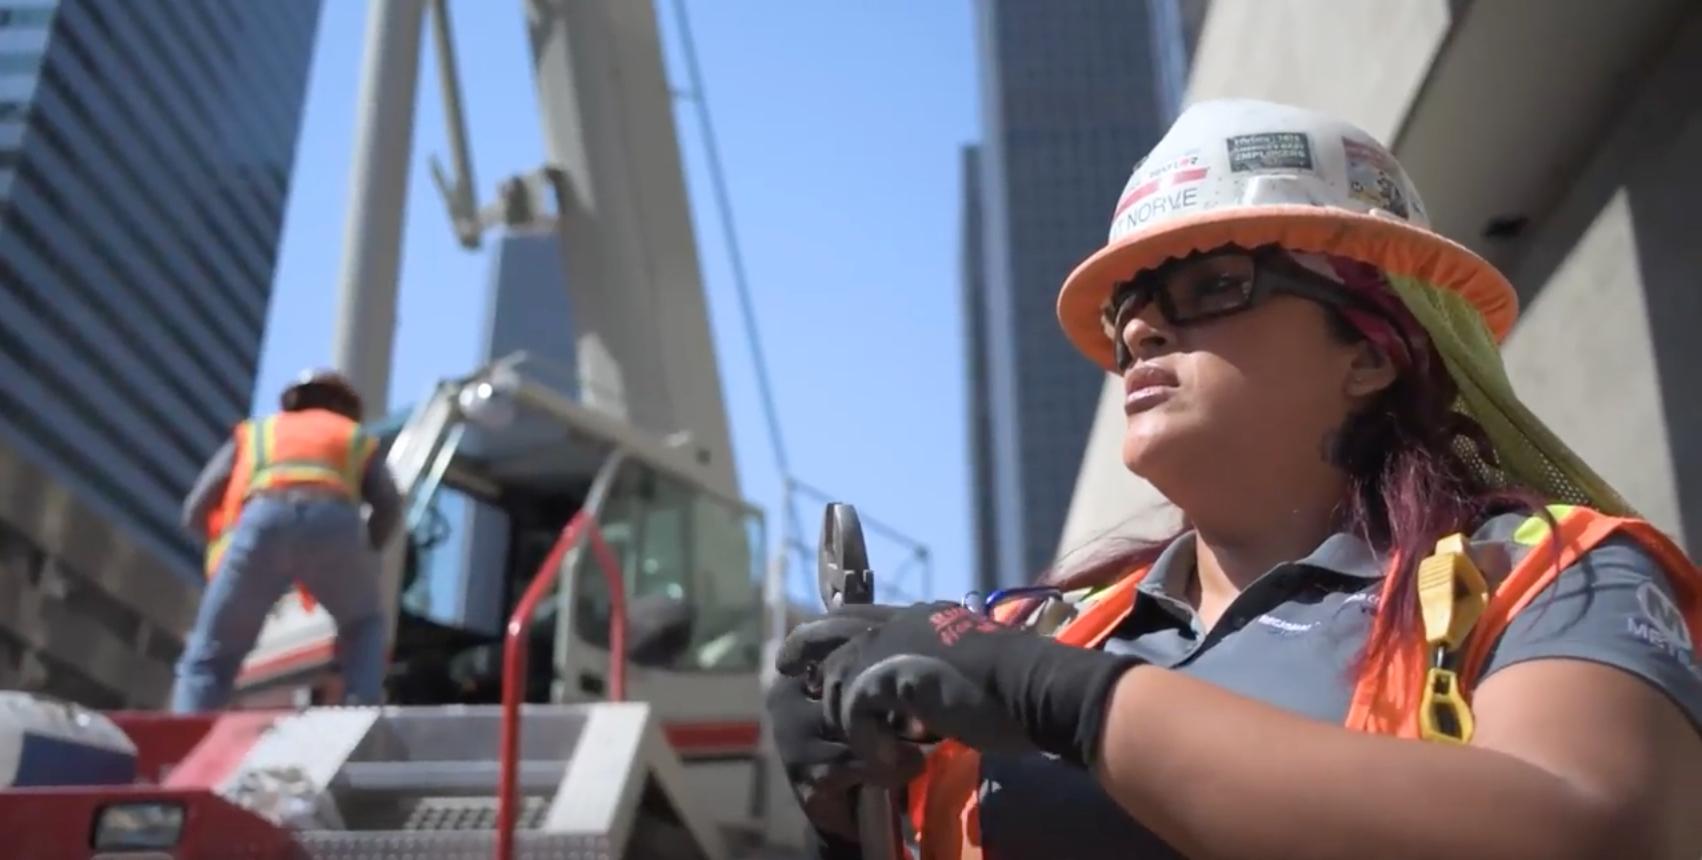 Video: Metro's construction careers program helps single mom